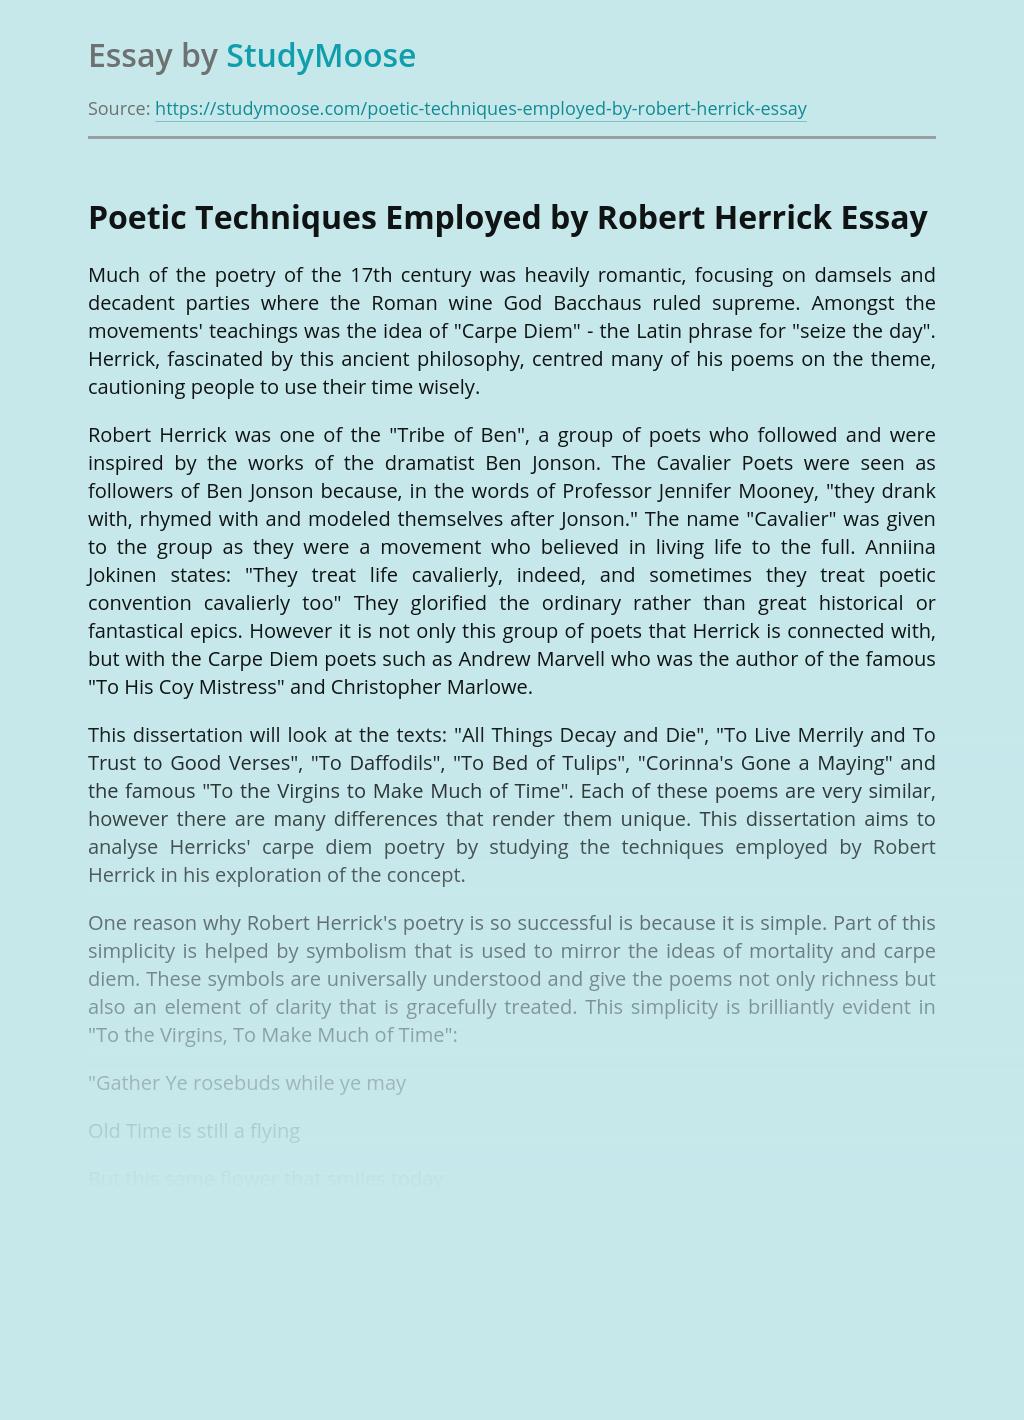 Poetic Techniques Employed by Robert Herrick